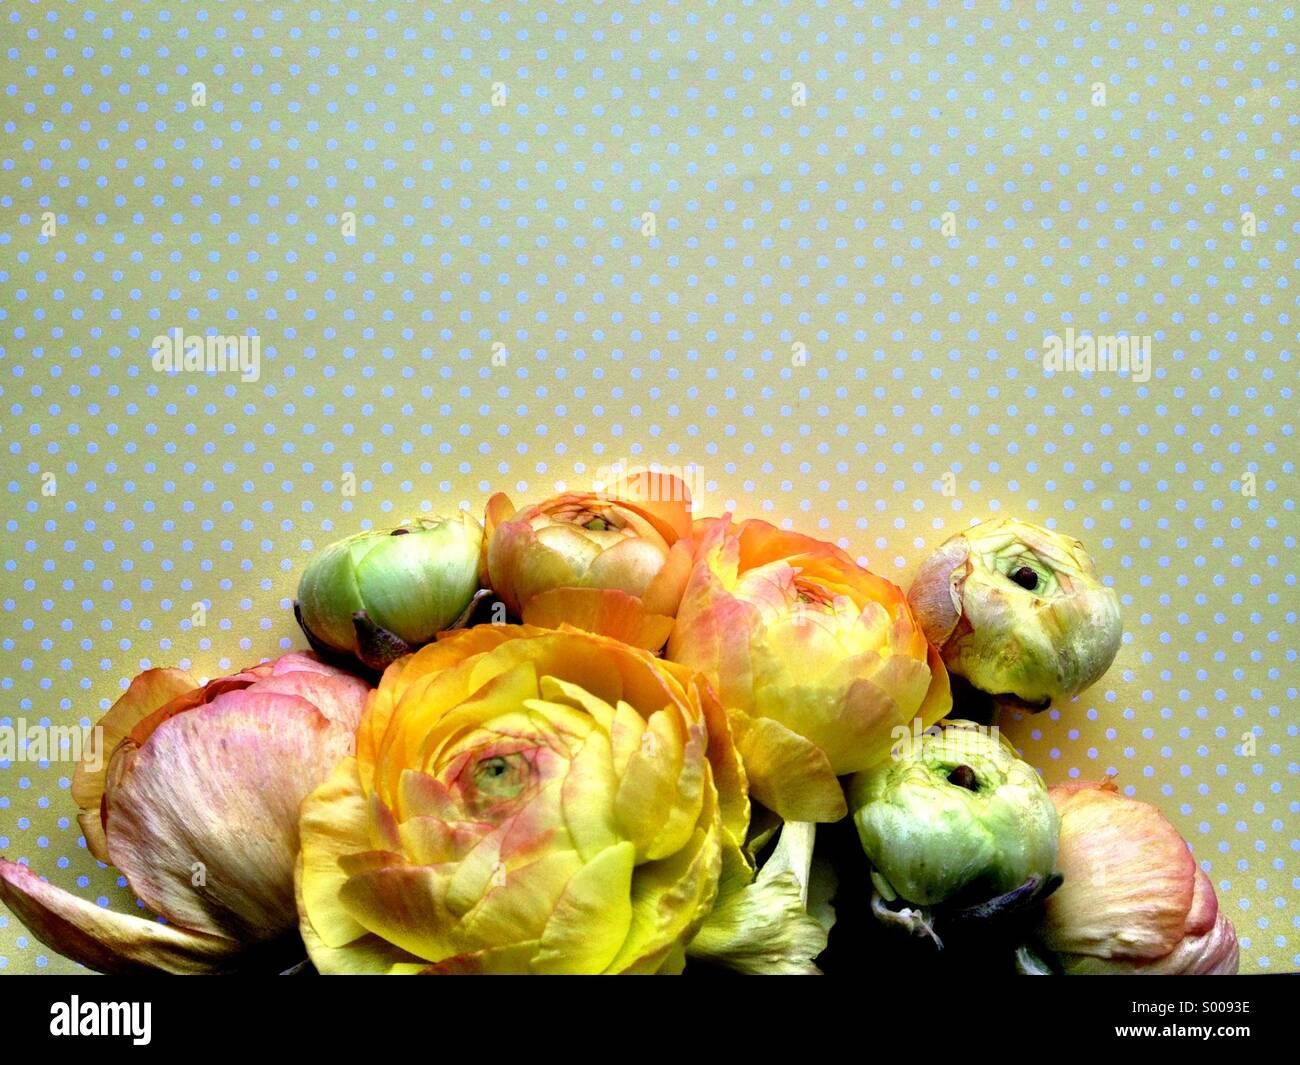 Ranunculus flowers on yellow polka dots - Stock Image